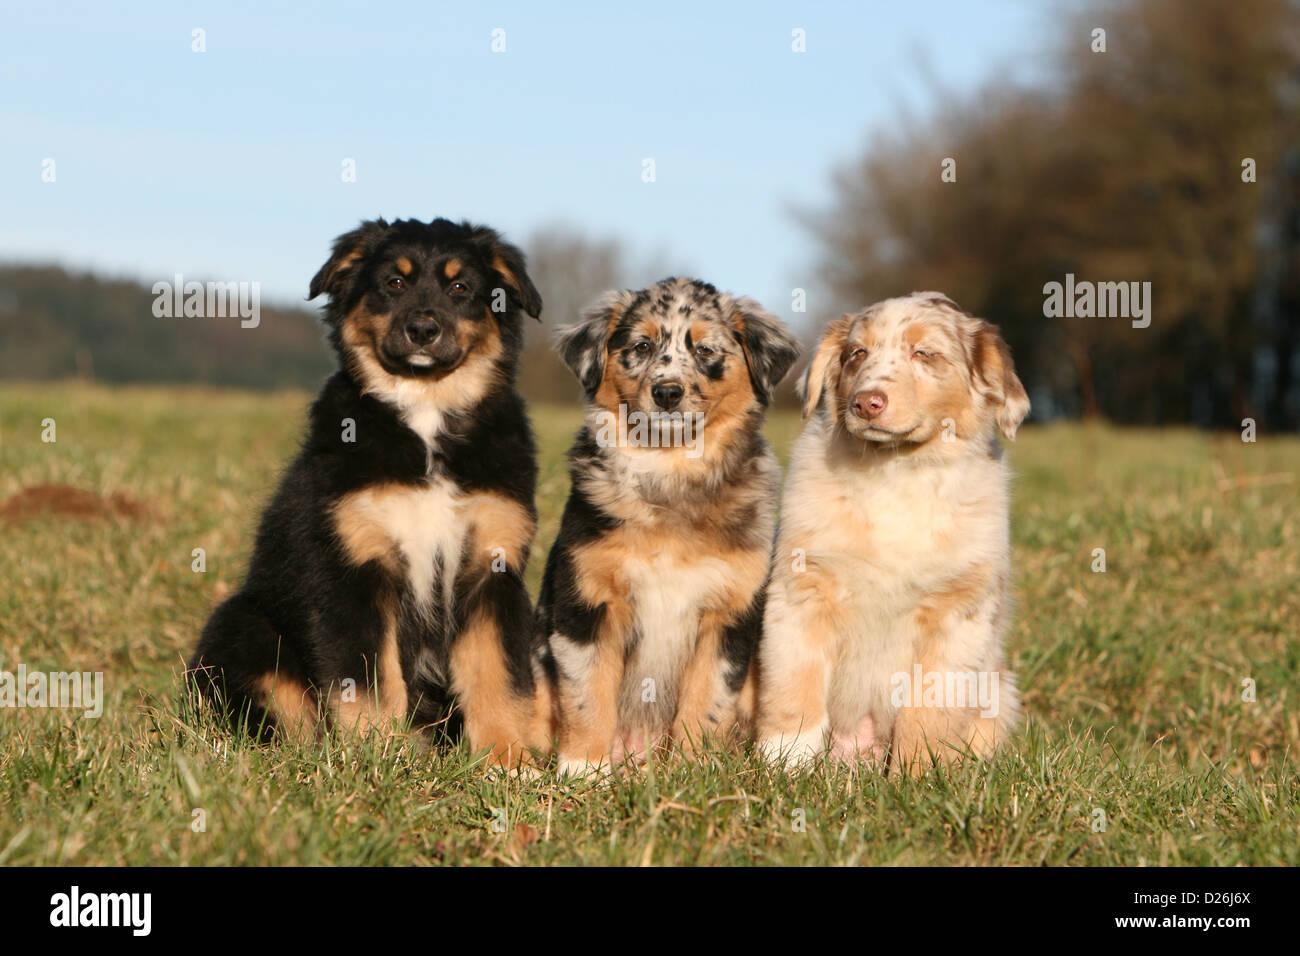 Dog Australian Shepherd Aussie Two Puppies Different Colors Stock Photo Alamy